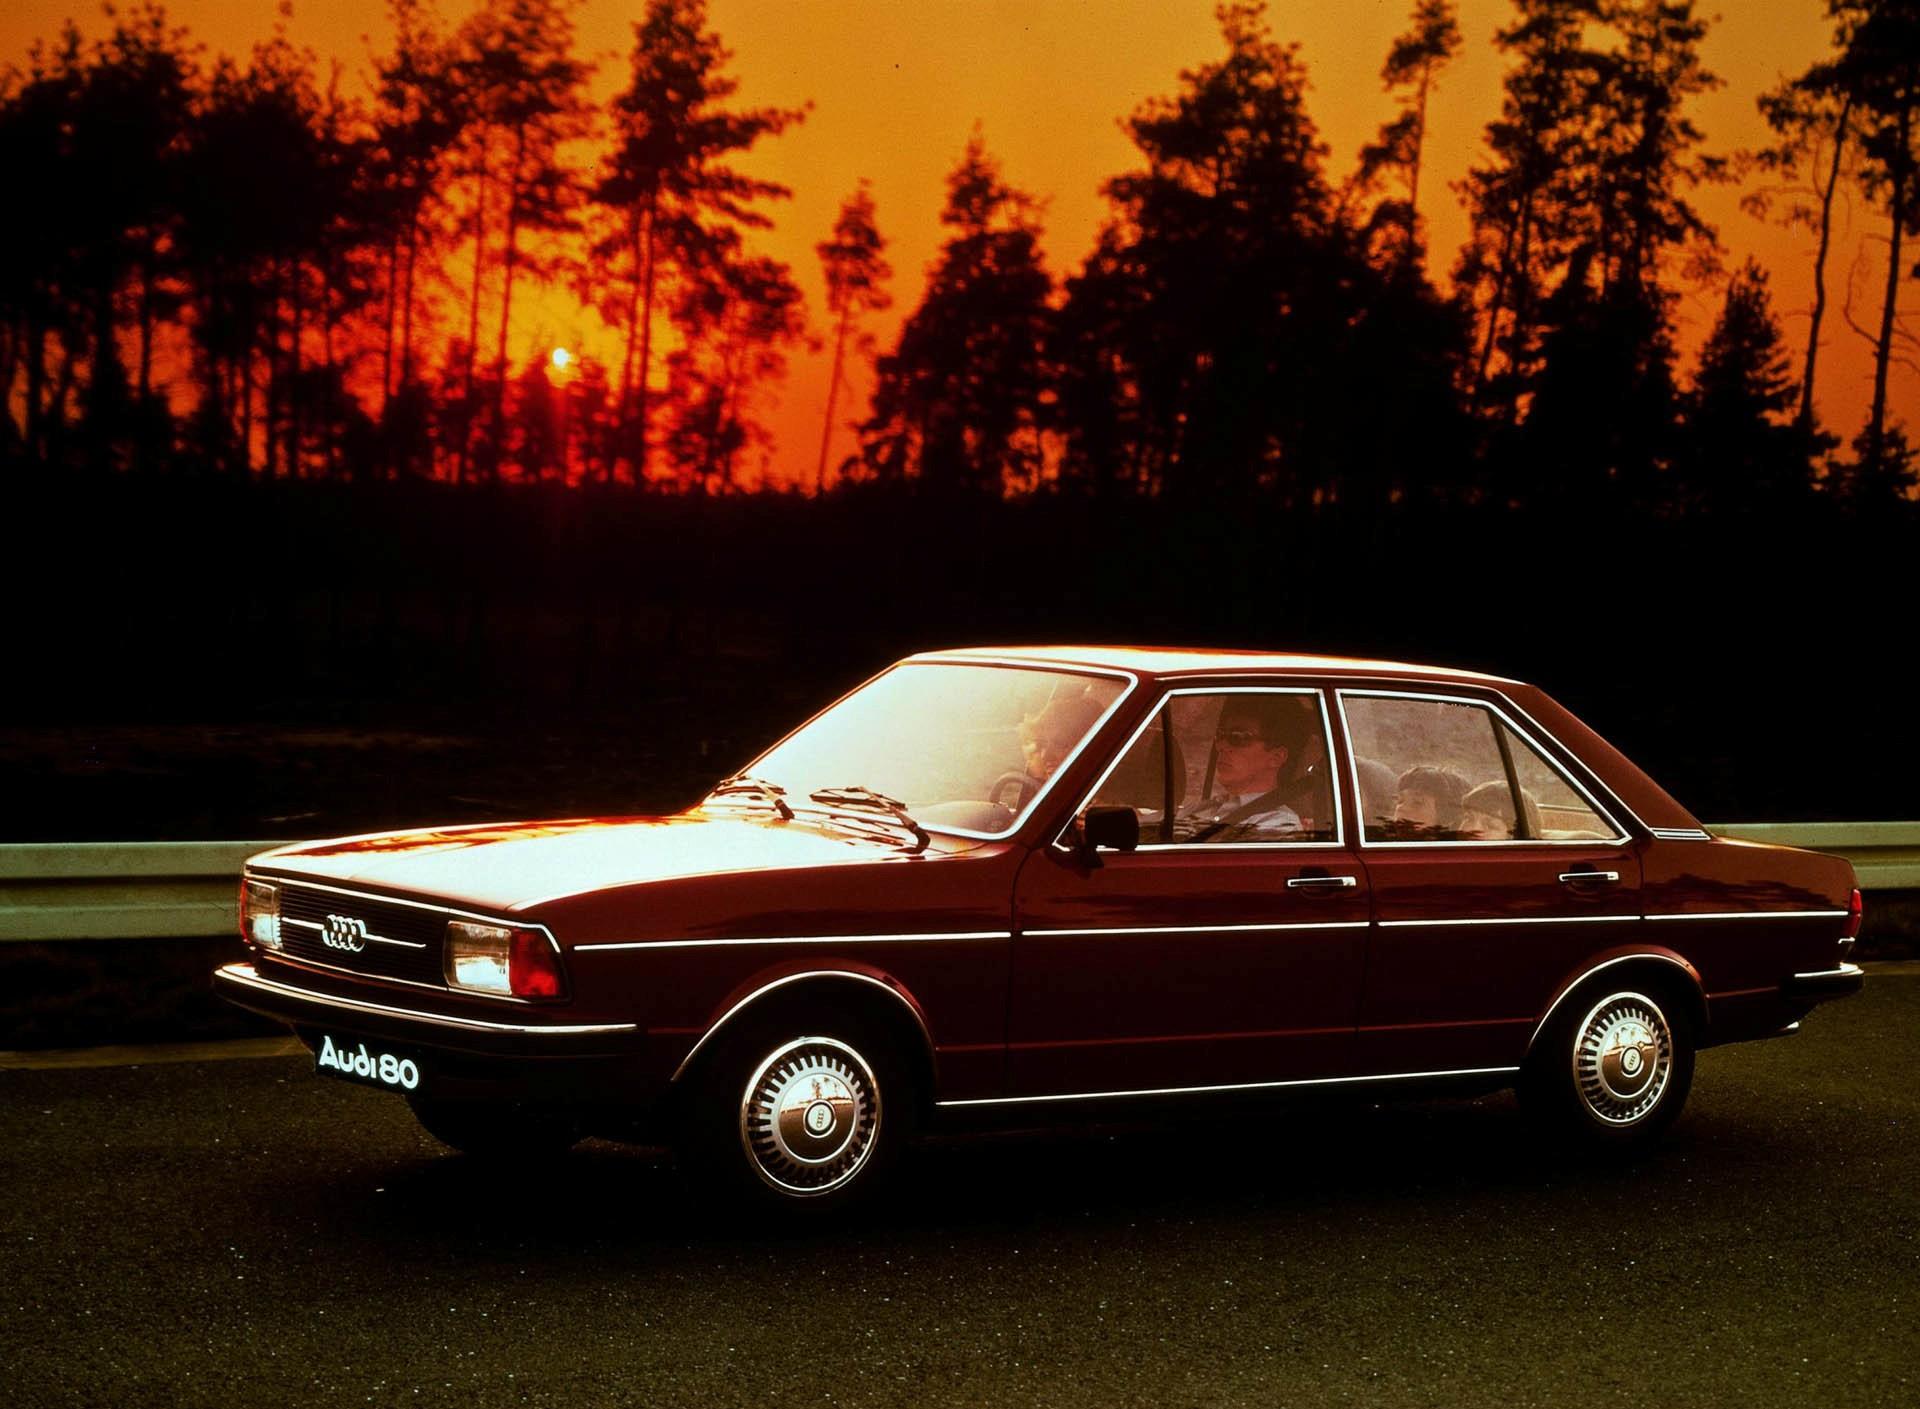 top sport cars audi 80 beautiful car models Audi History Timeline 1992 audi 80